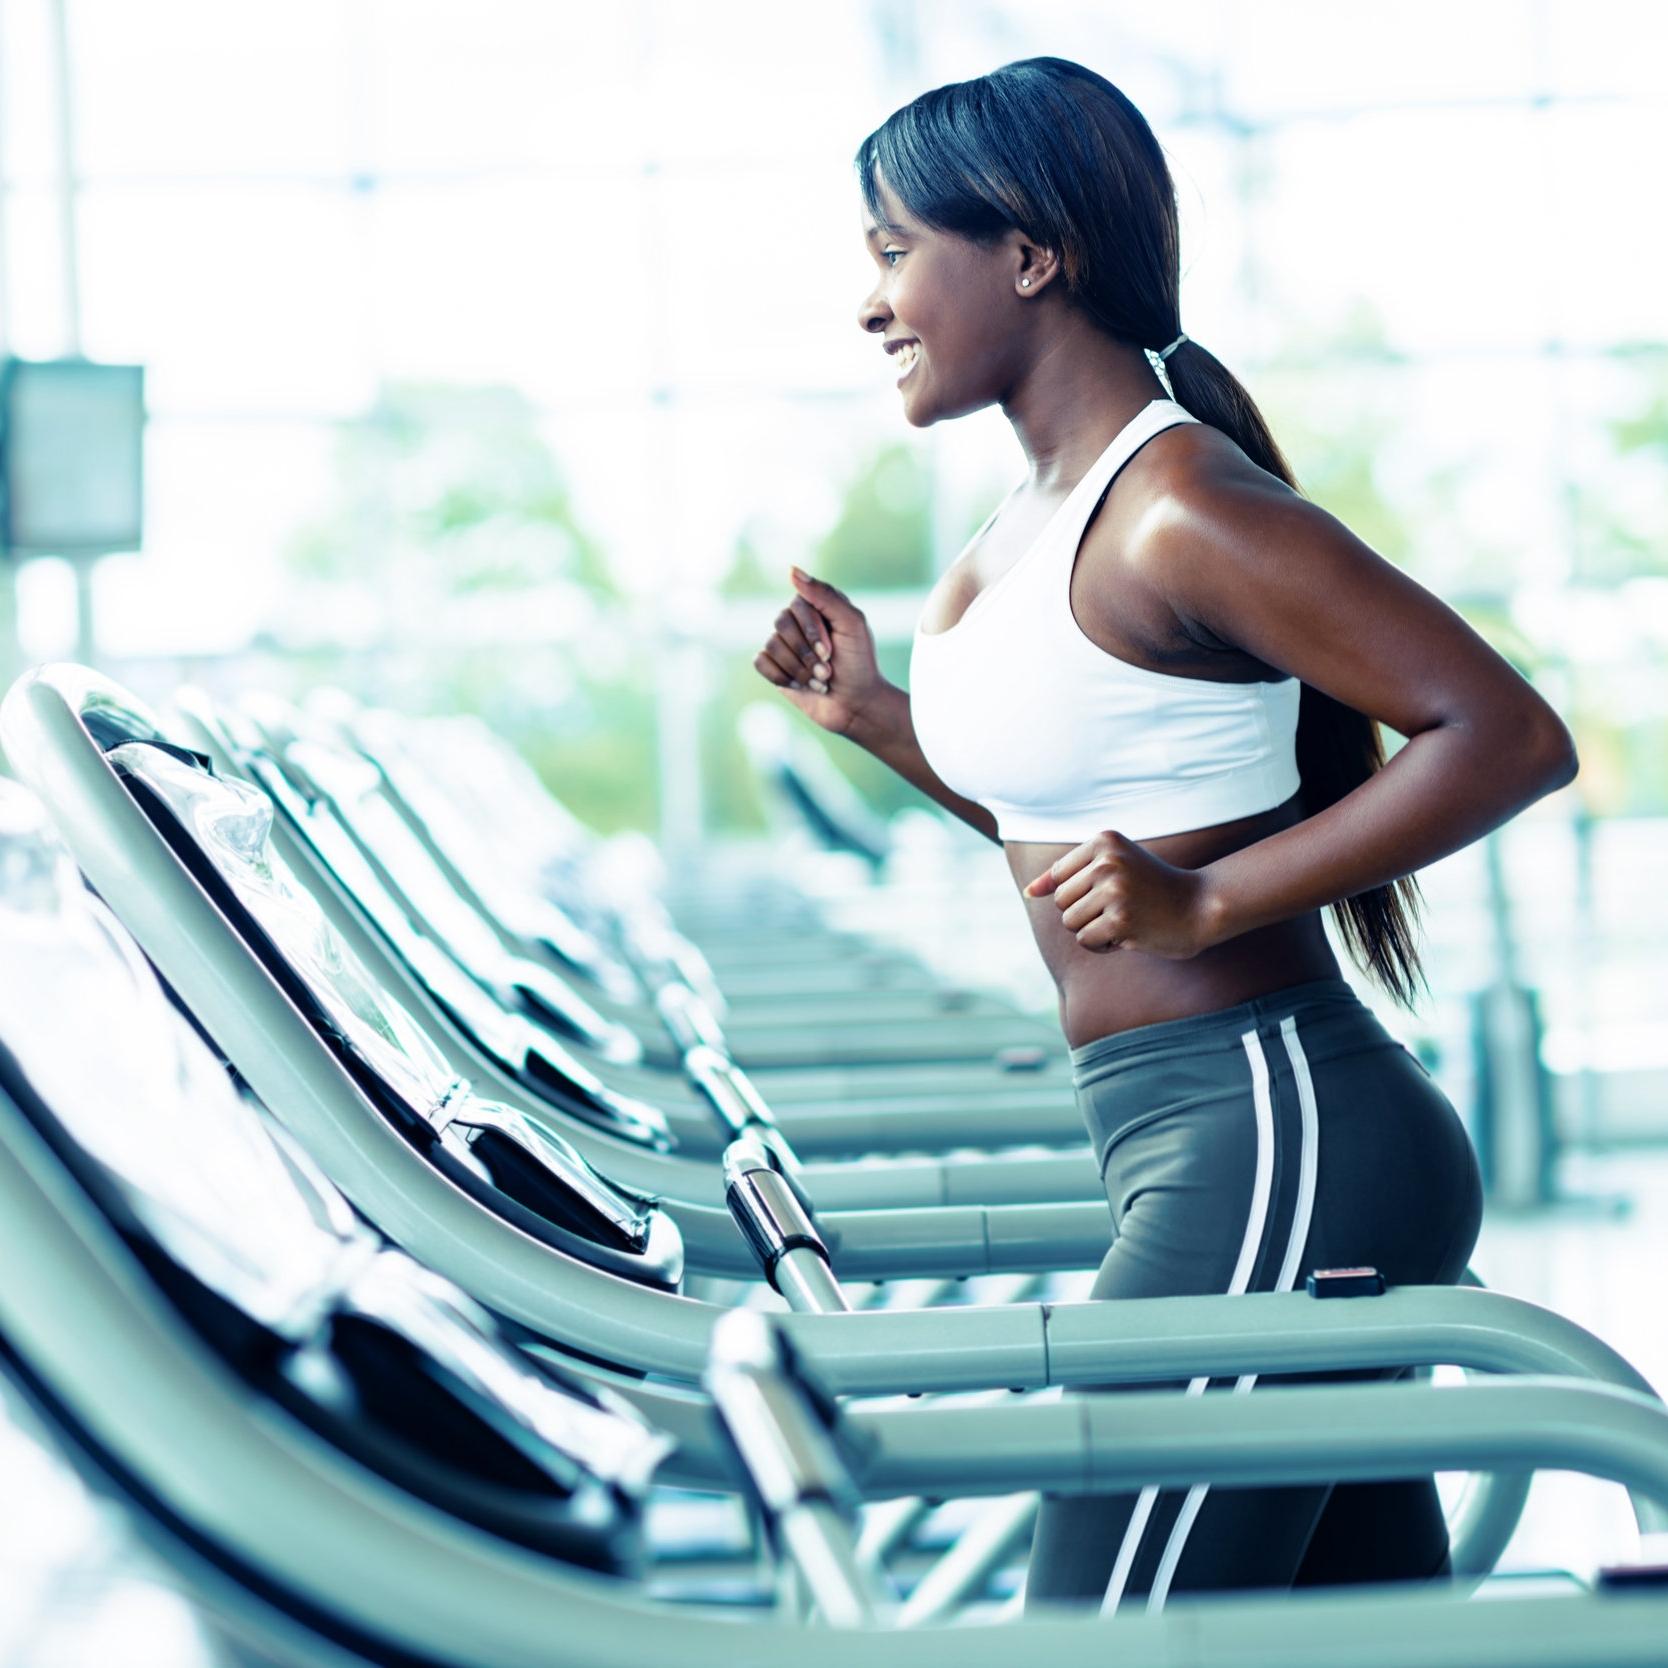 bigstock-Woman-running-on-a-treadmill-a-46865296.jpg